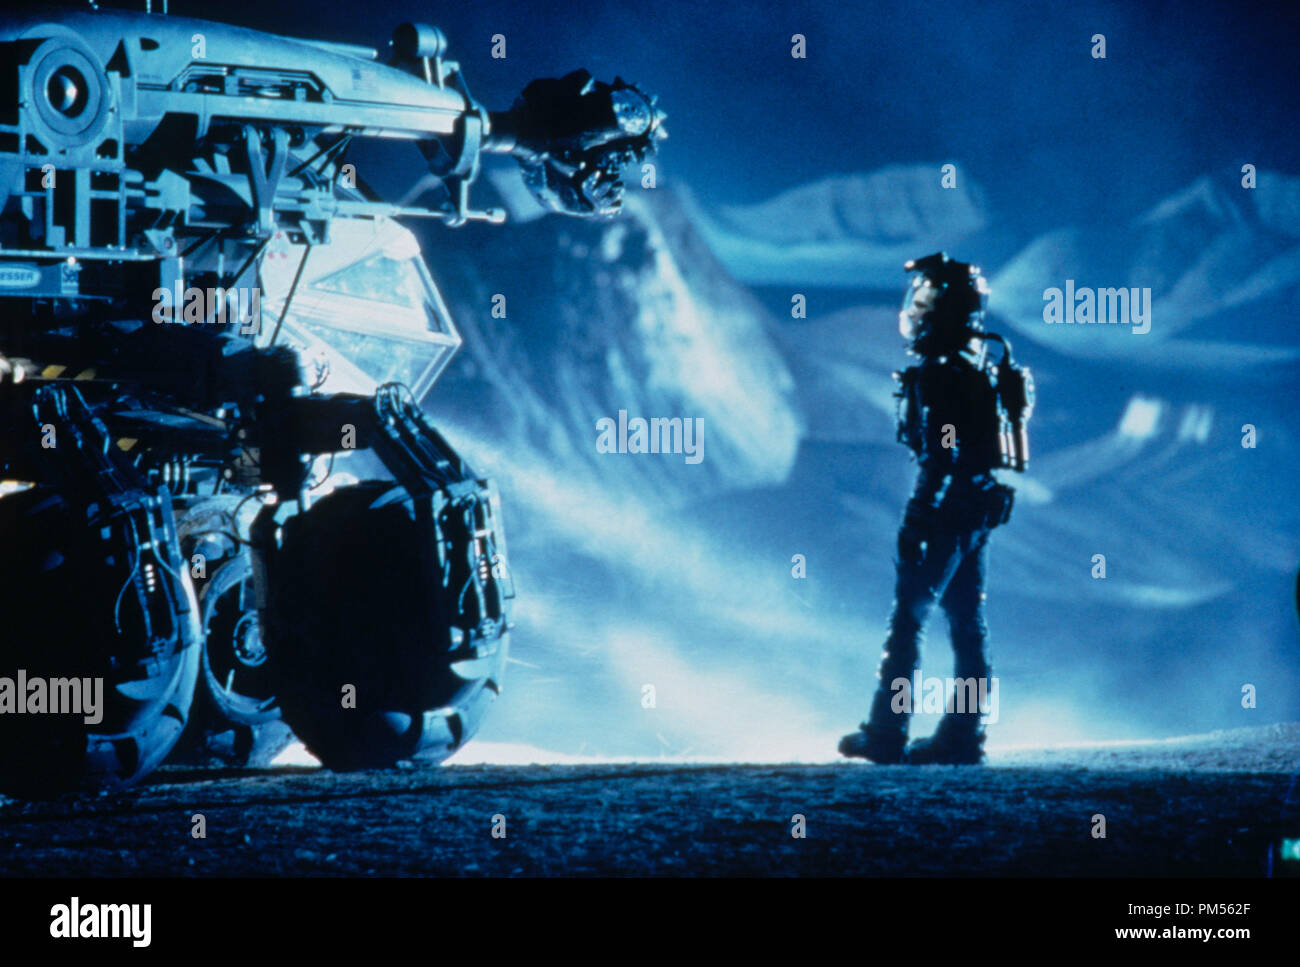 'Armageddon' 1998 Scene Still - Stock Image